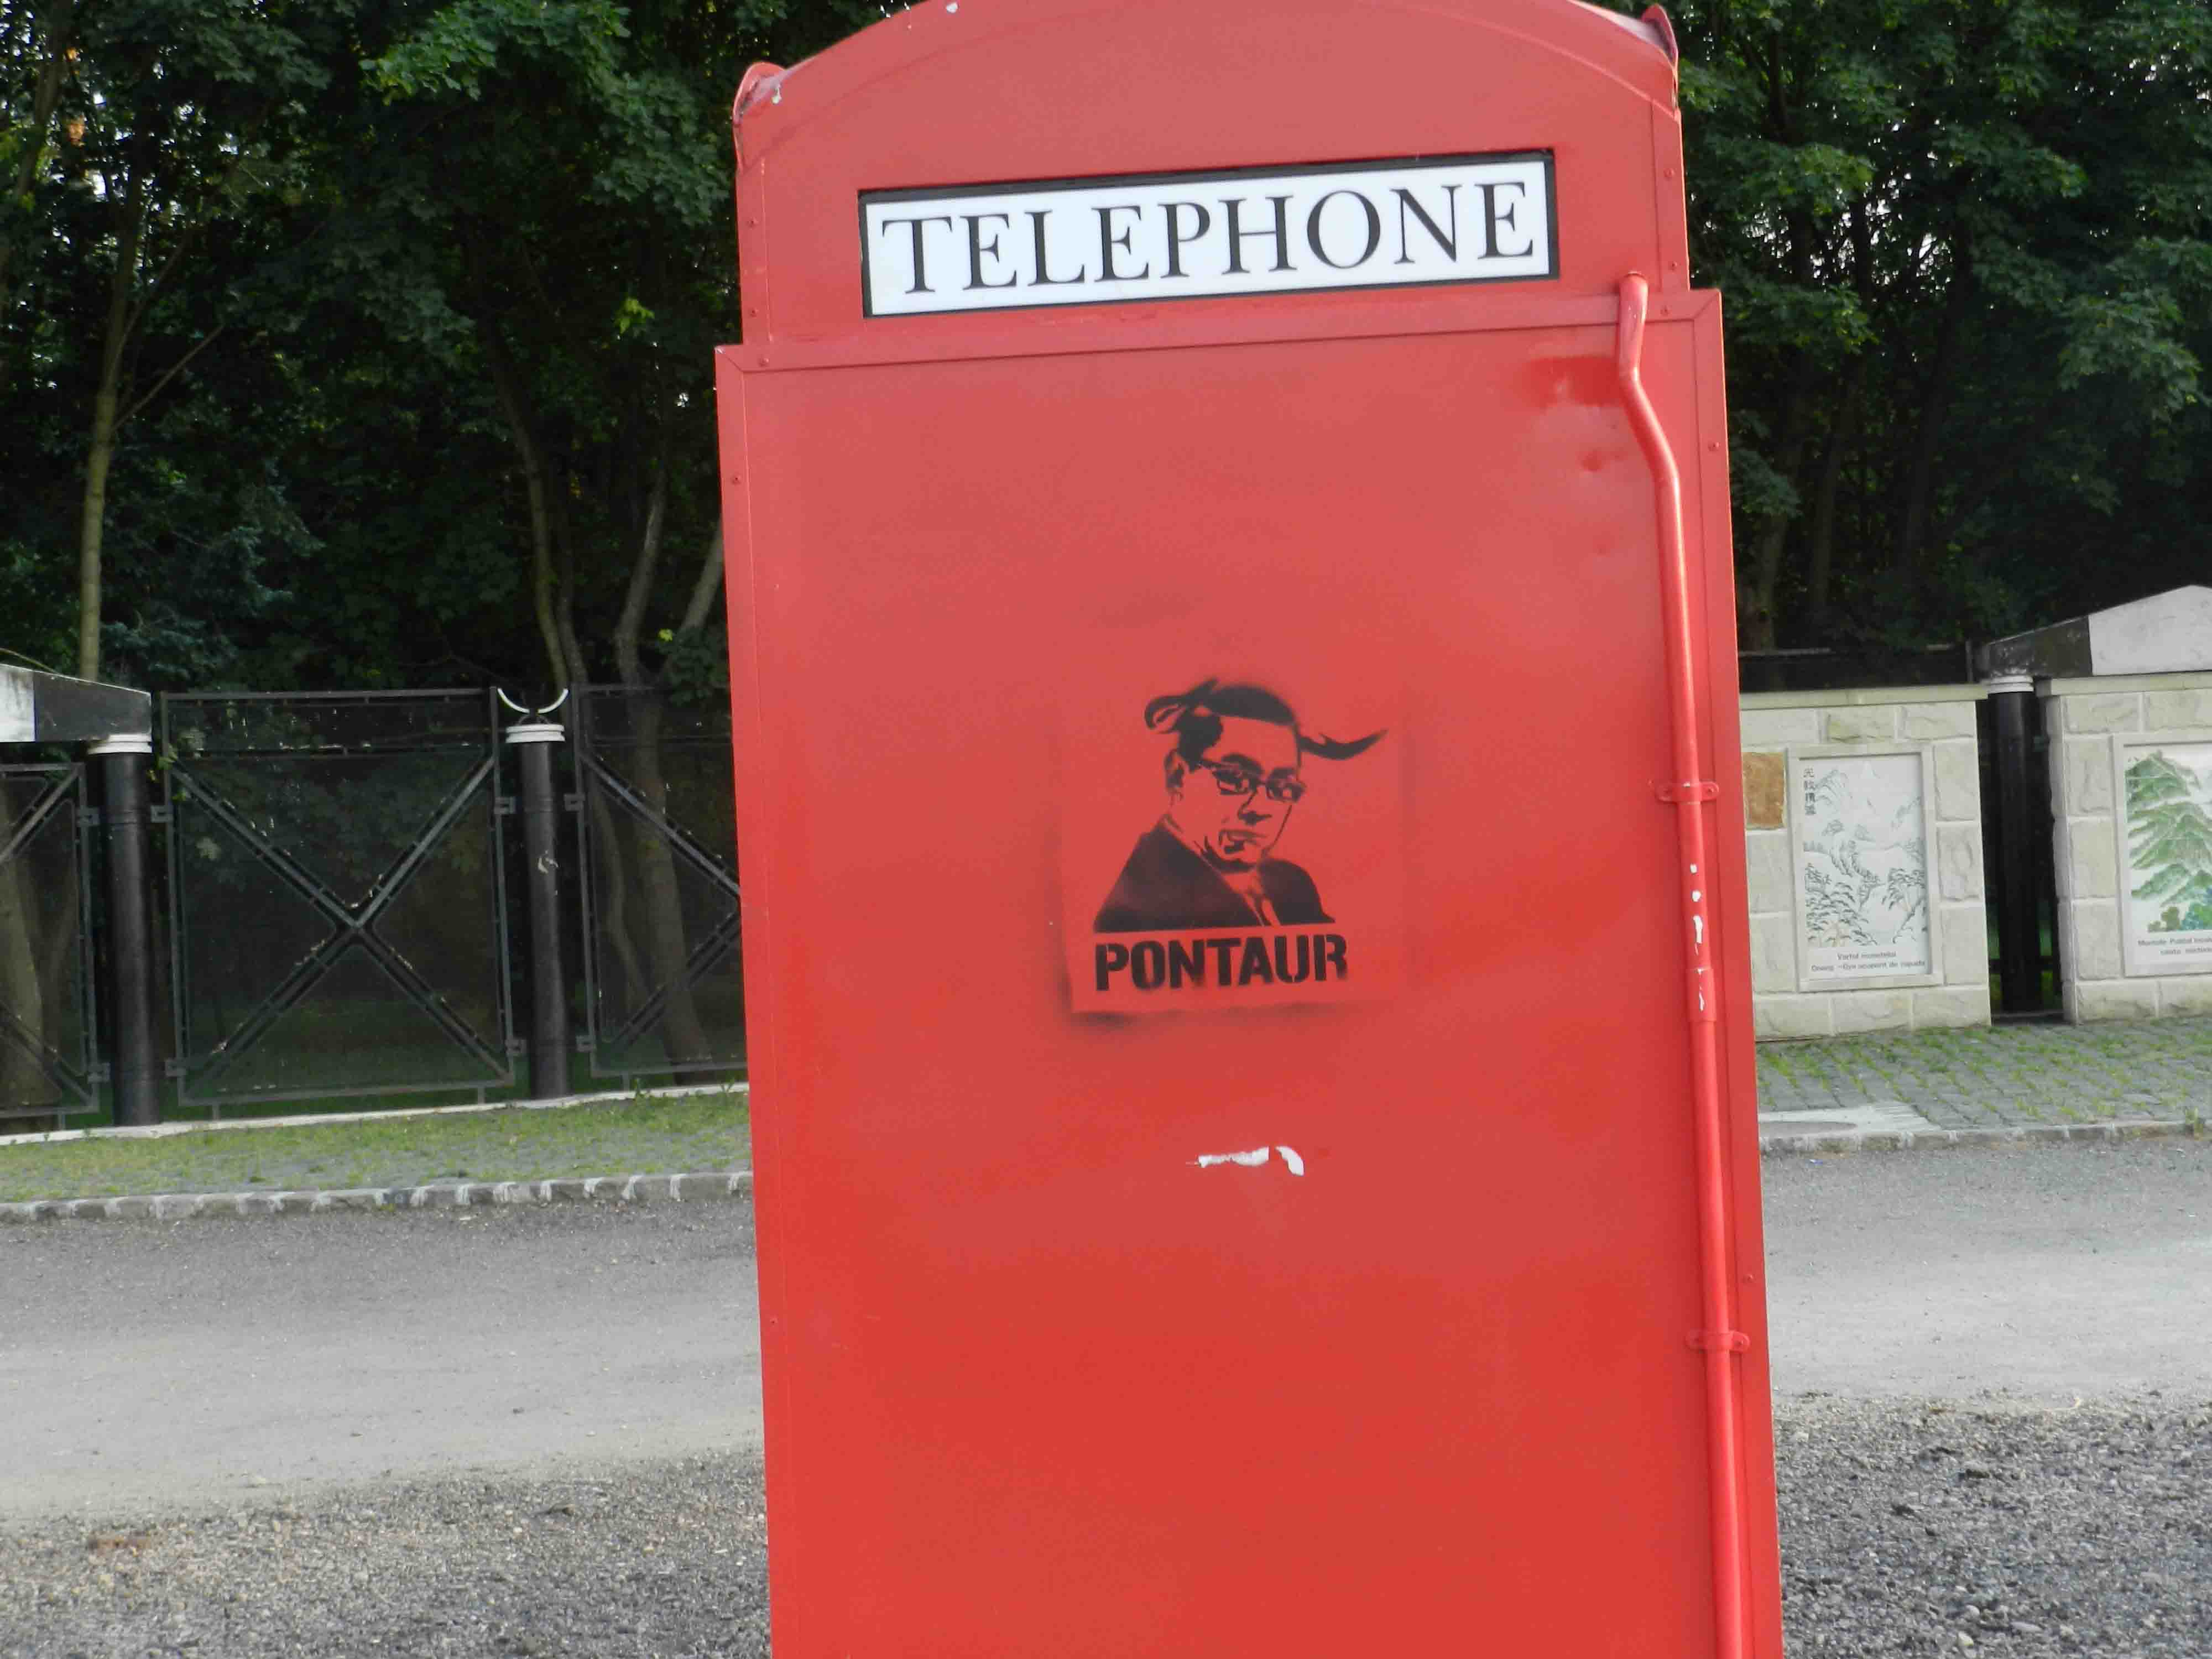 cabina telefonica britanica